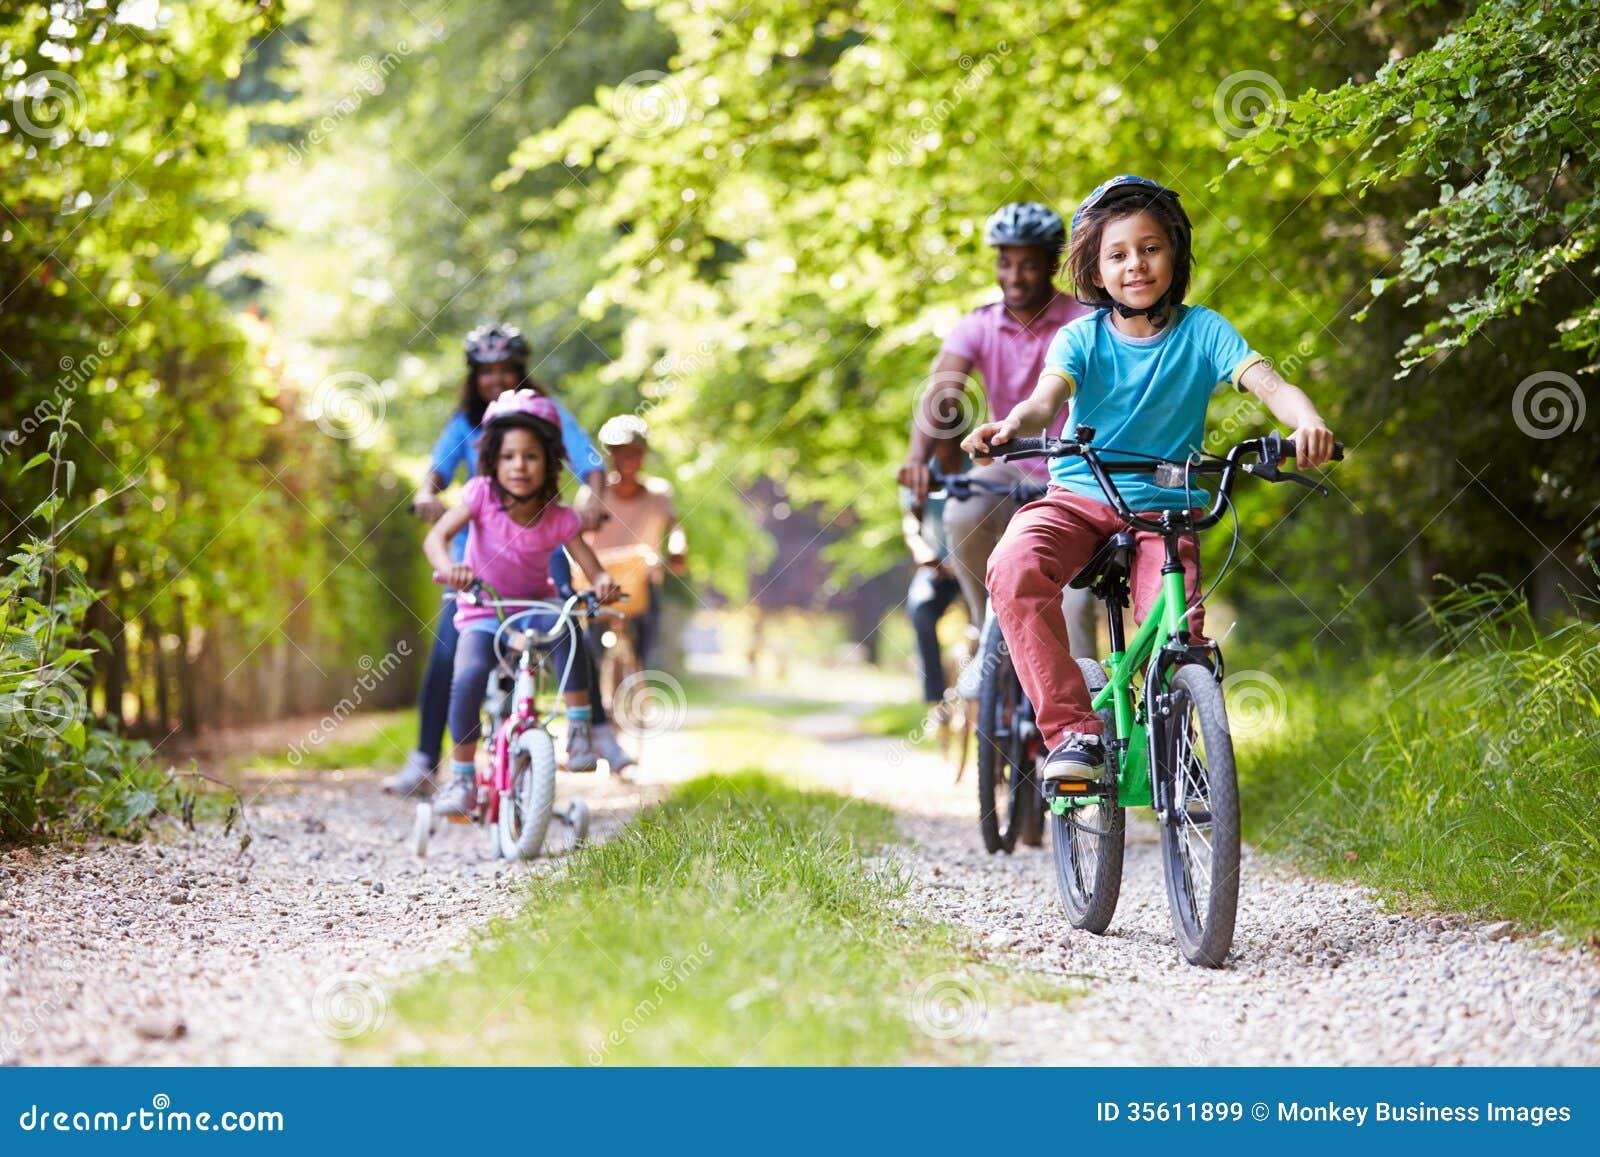 Multi Generations-Afroamerikaner-Familie auf Zyklus-Fahrt